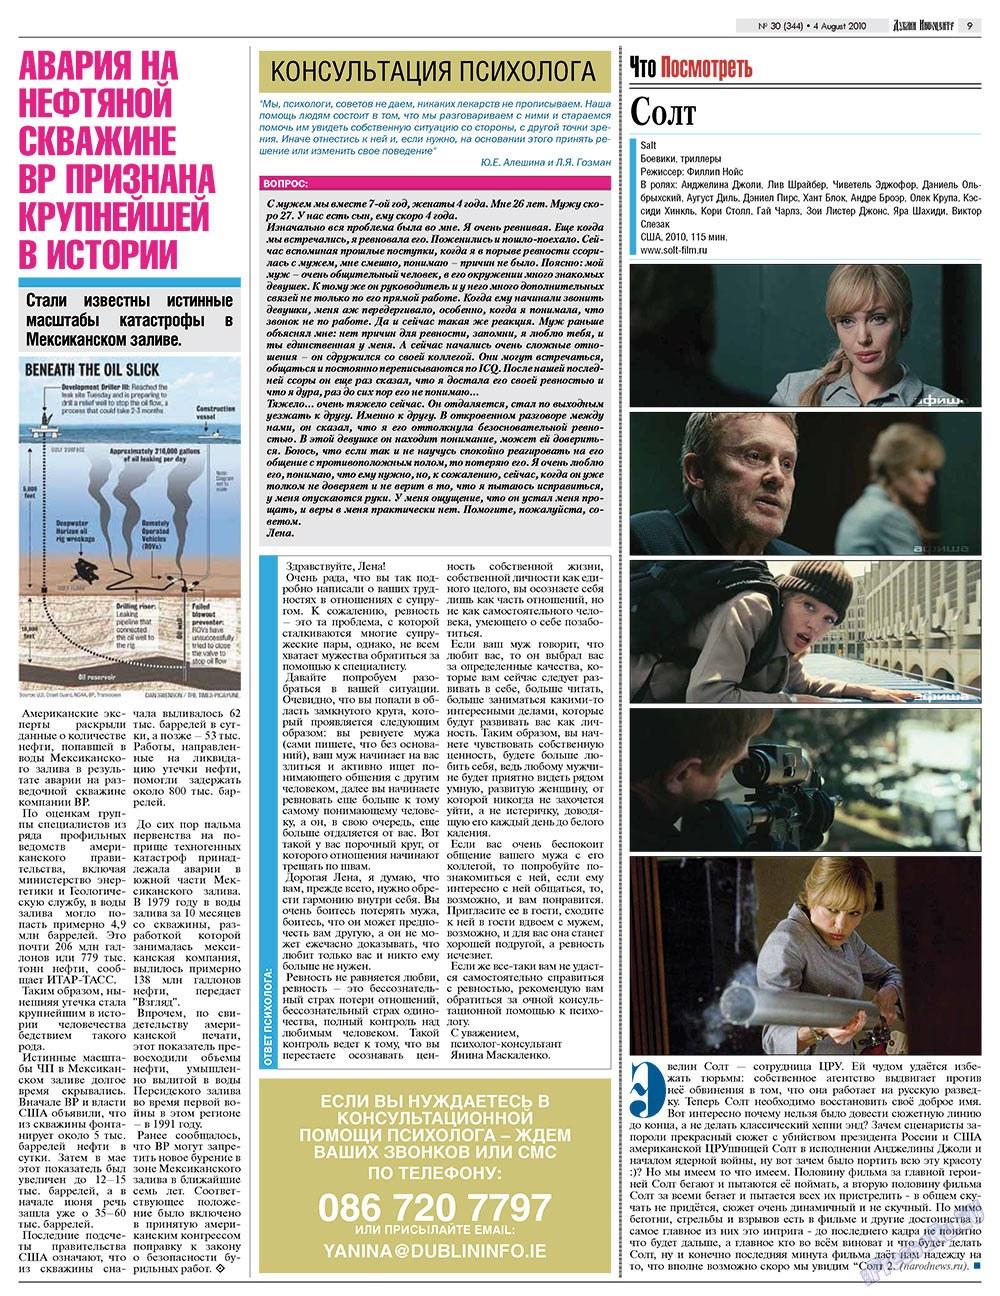 Дублин инфоцентр (газета). 2010 год, номер 30, стр. 9